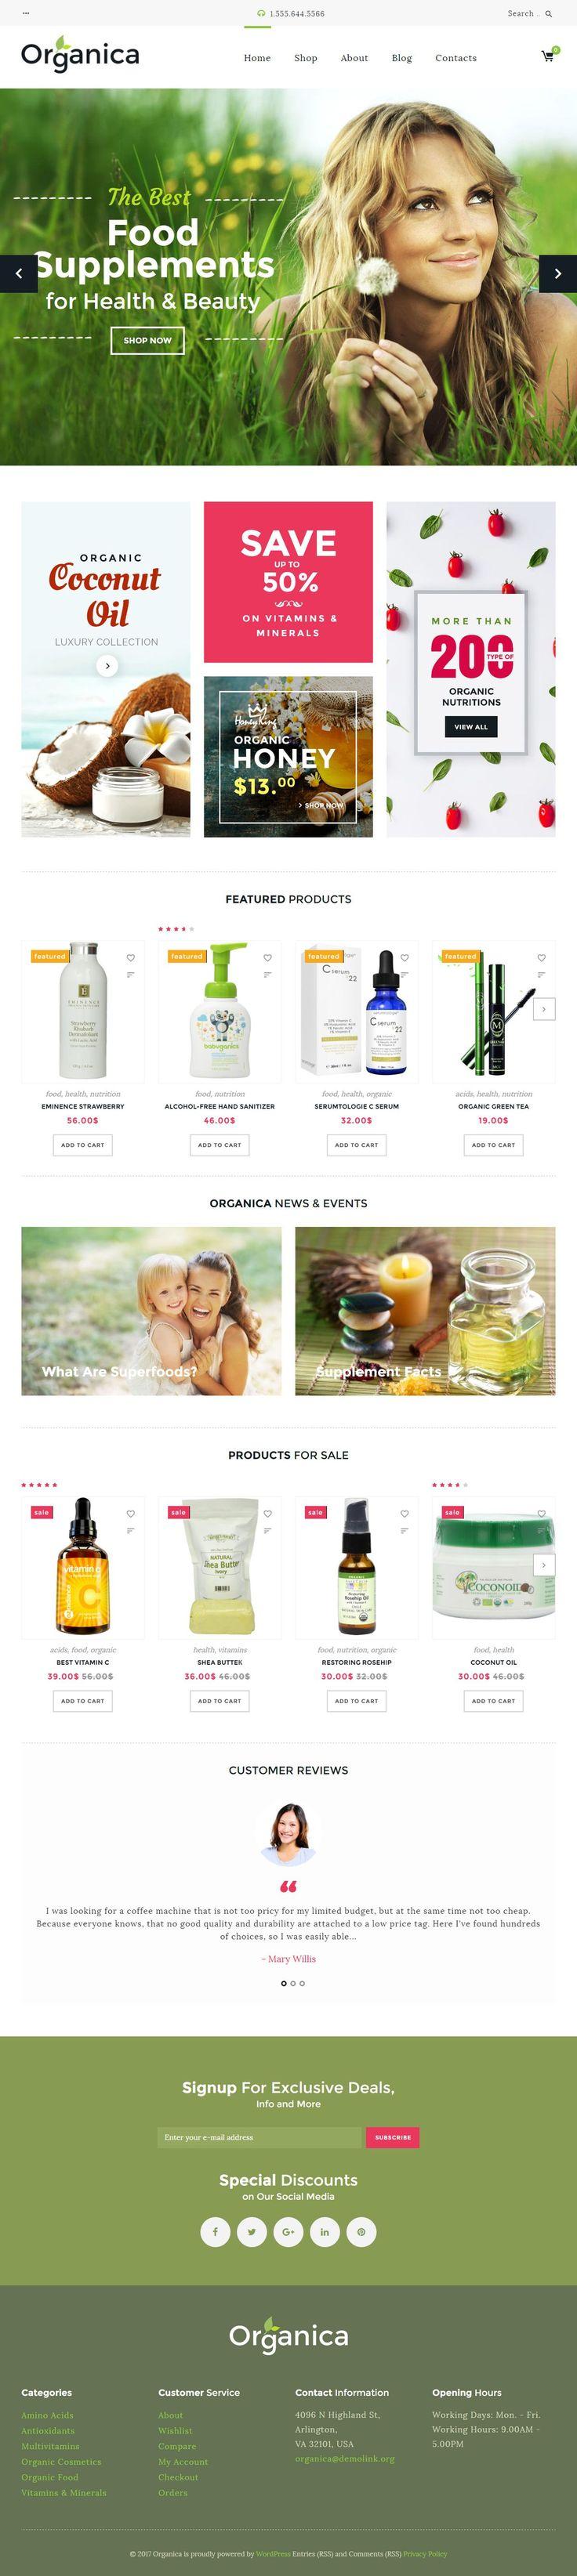 Organica is Premium full Responsive #WordPress Theme. If you like this #WooCommerce Theme visit our handpicked list of best #OrganicFood Themes at: http://www.responsivemiracle.com/best-wordpress-organic-food-theme/ Está farto de procurar por templates WordPress? Fizemos um E-Book GRATUITO com OS 150 MELHORES TEMPLATES WORDPRESS. Clique aqui http://www.estrategiadigital.pt/150-melhores-templates-wordpress/ para fazer download imediato!